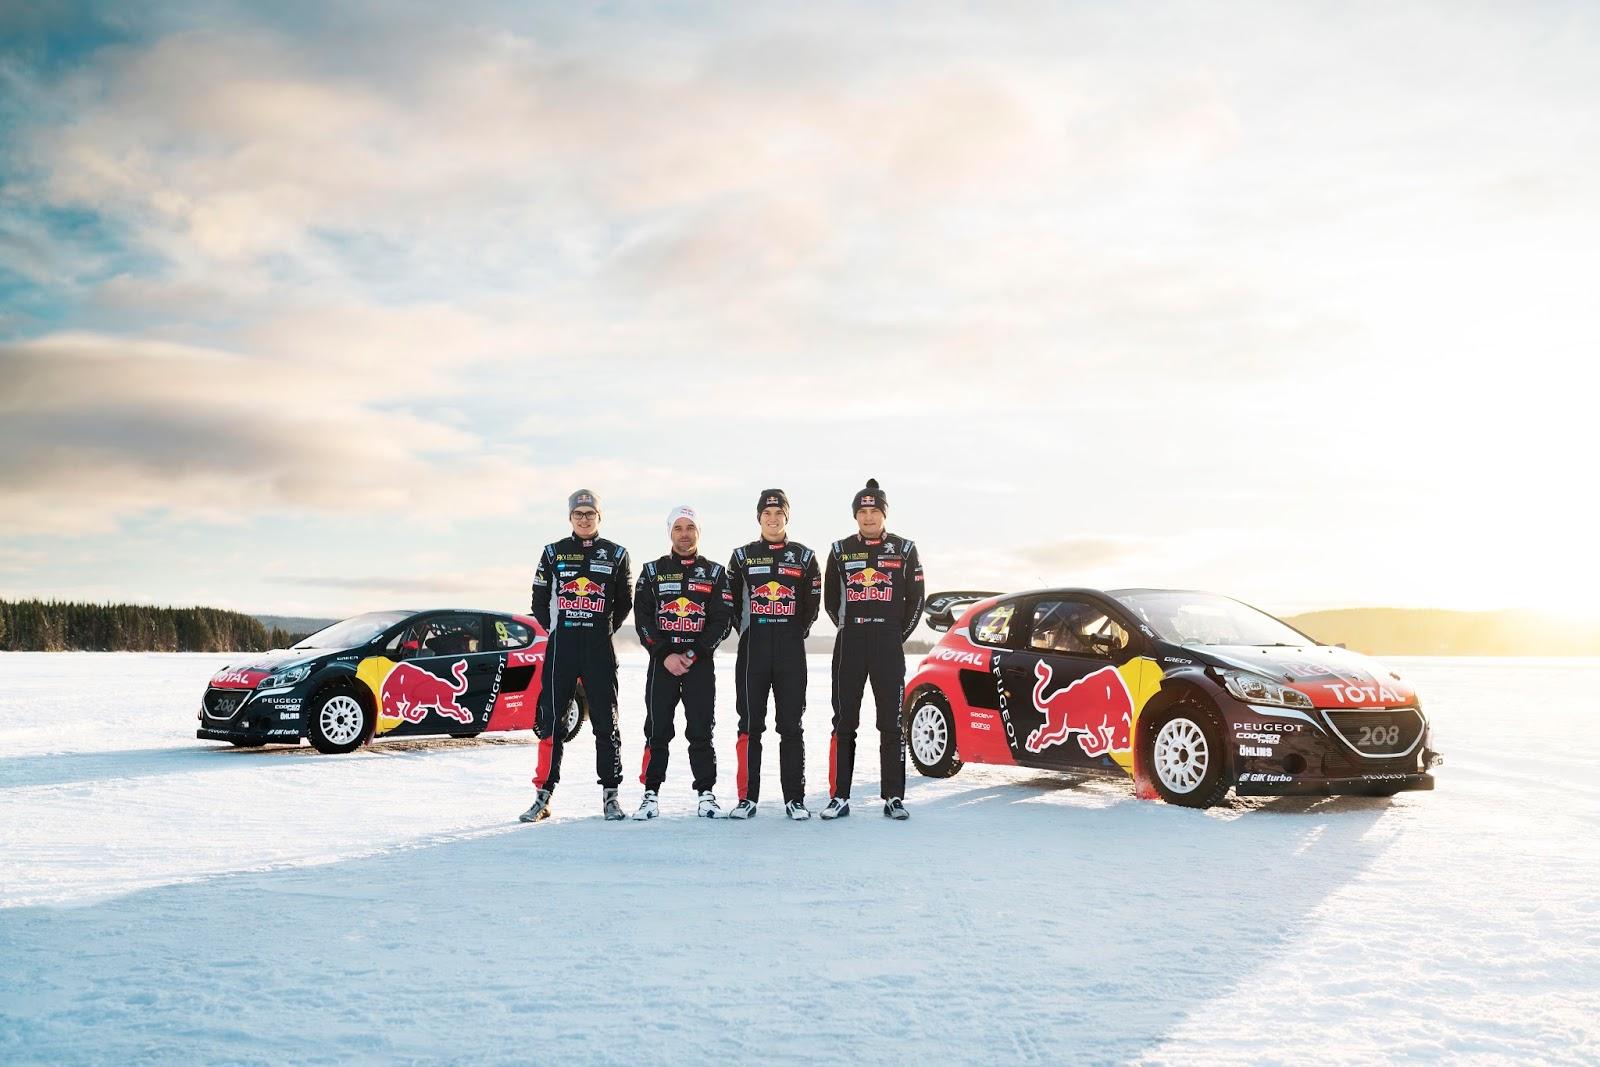 56d078d156042255B1255D Έτοιμα για μάχη τα PEUGEOT 208 WRX, έτοιμος και ο Sébastien Loeb για το World RX! Hansen Motorsport, Peugeot, PEUGEOT 208 WRX, Peugeot Sport, Rally, Rallycross, videos, World RX, zblog